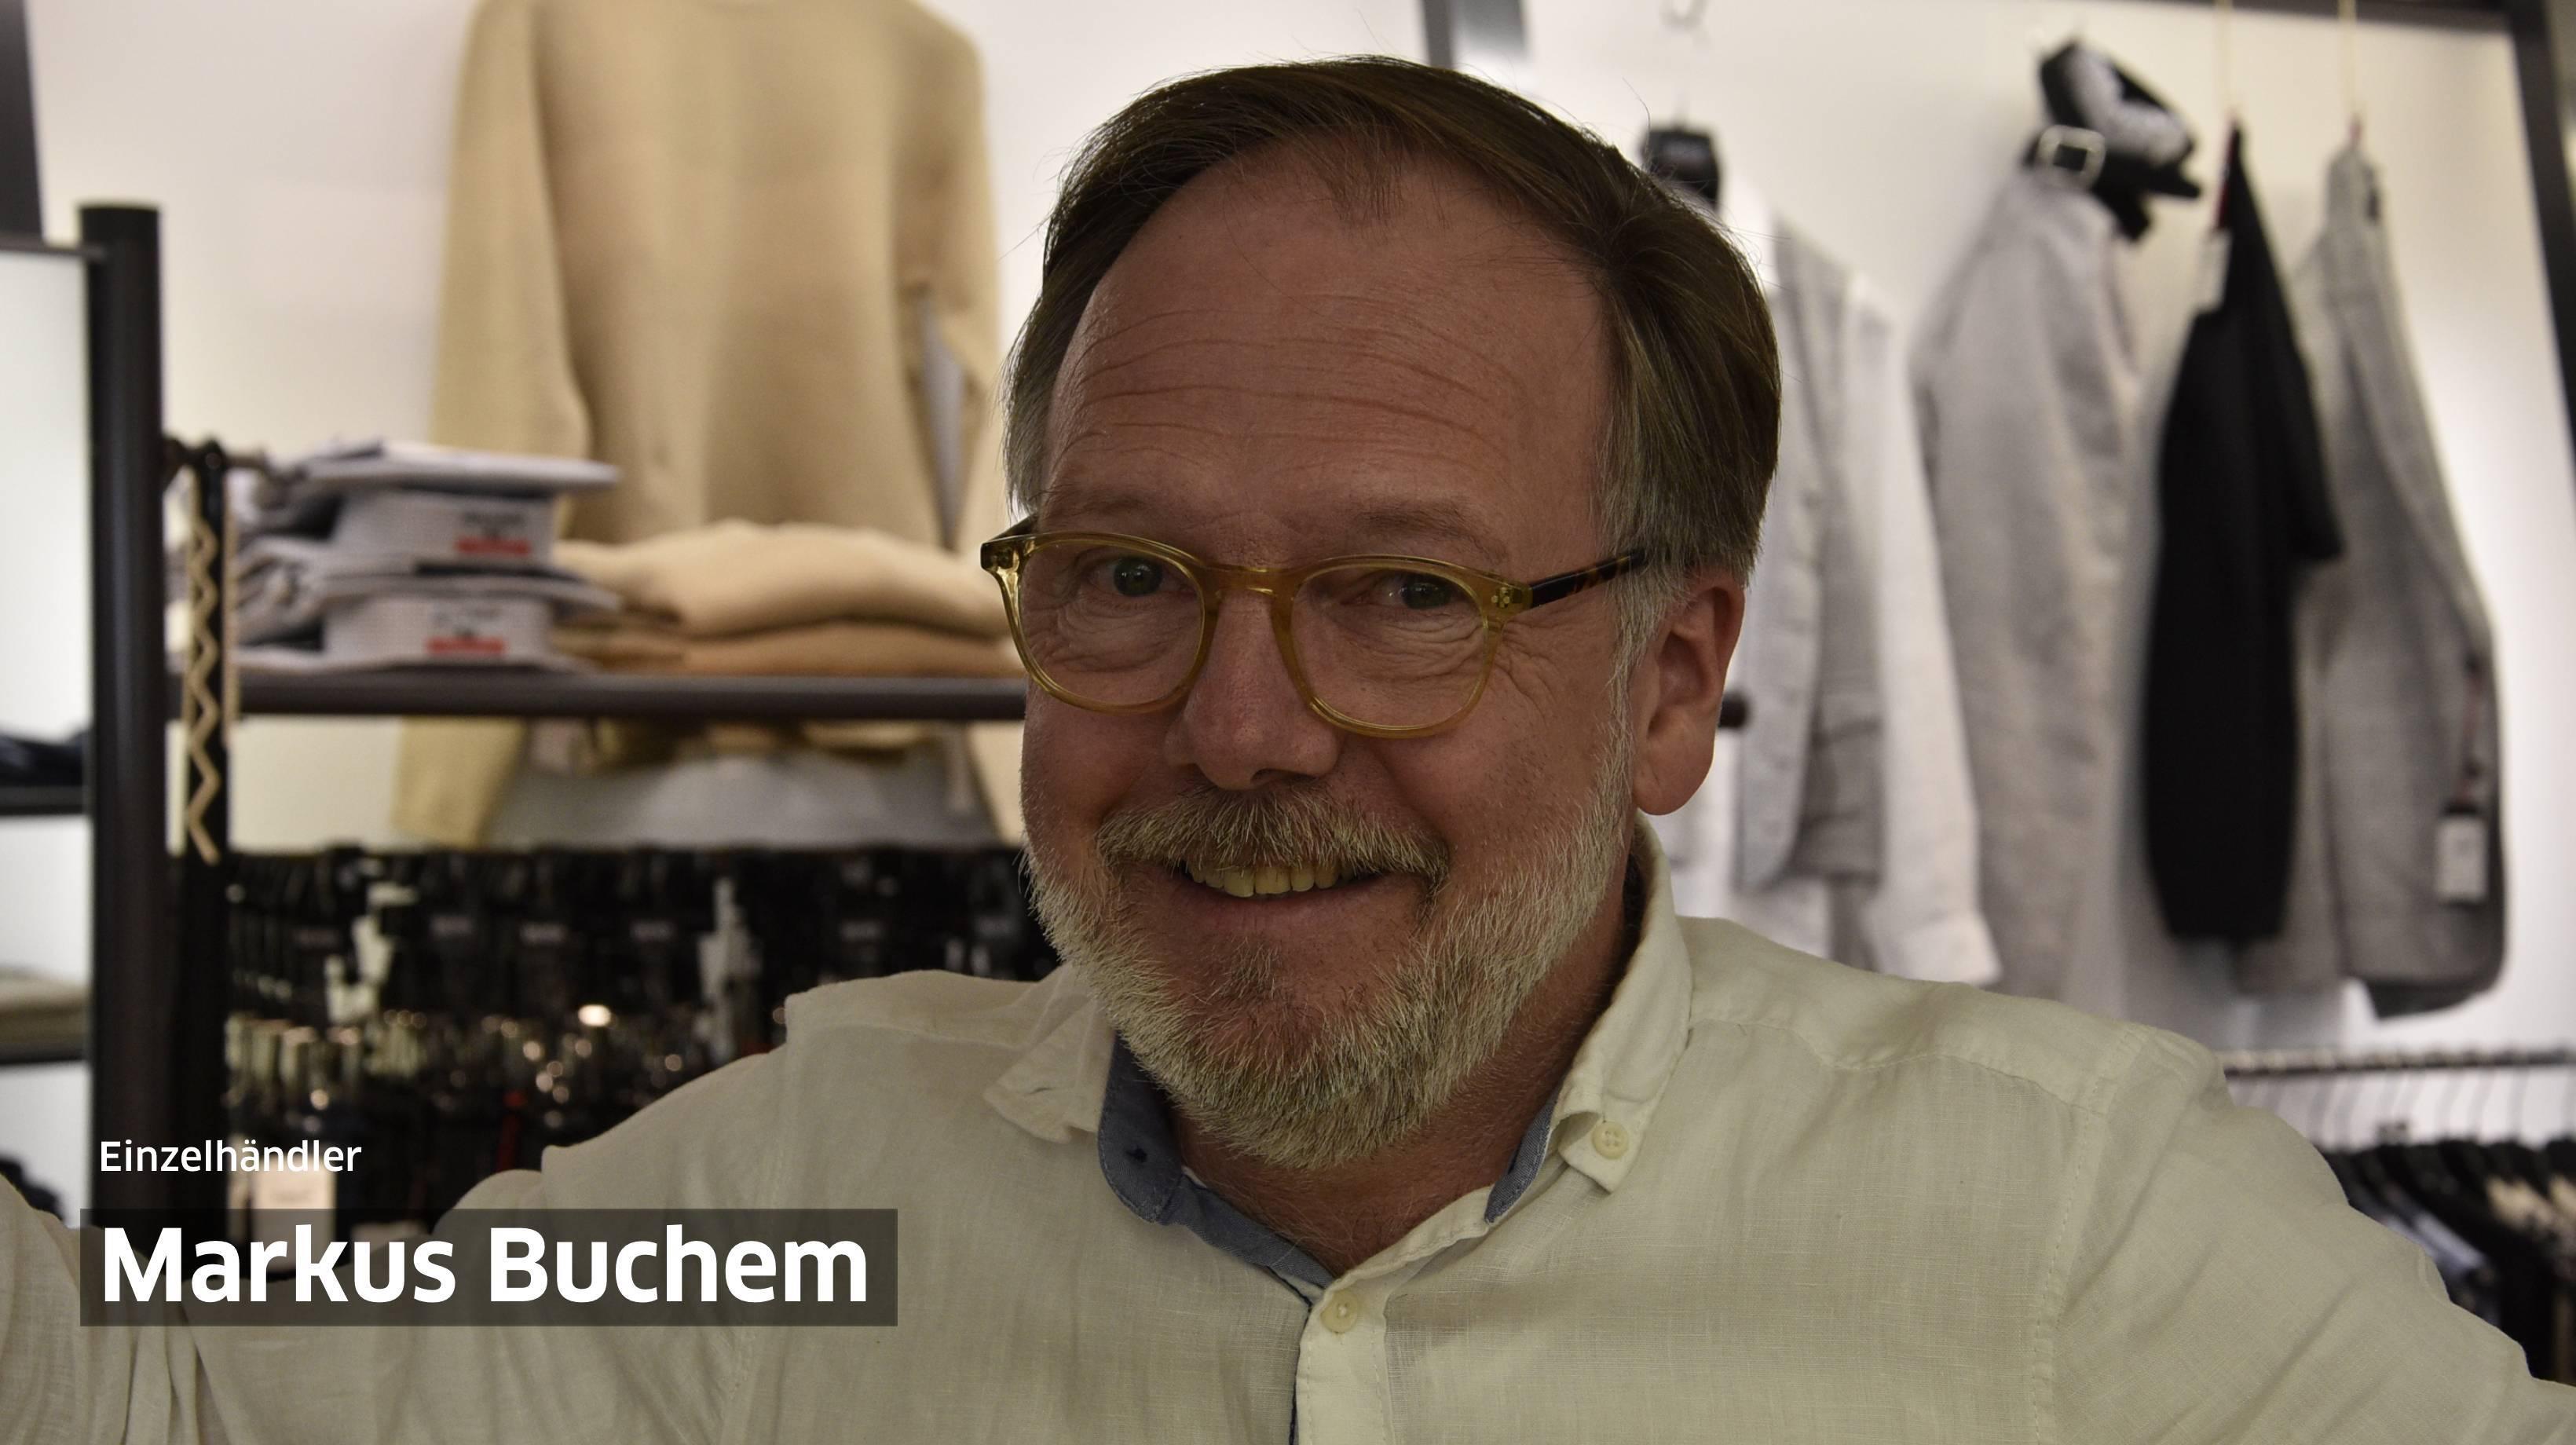 Markus Buchem